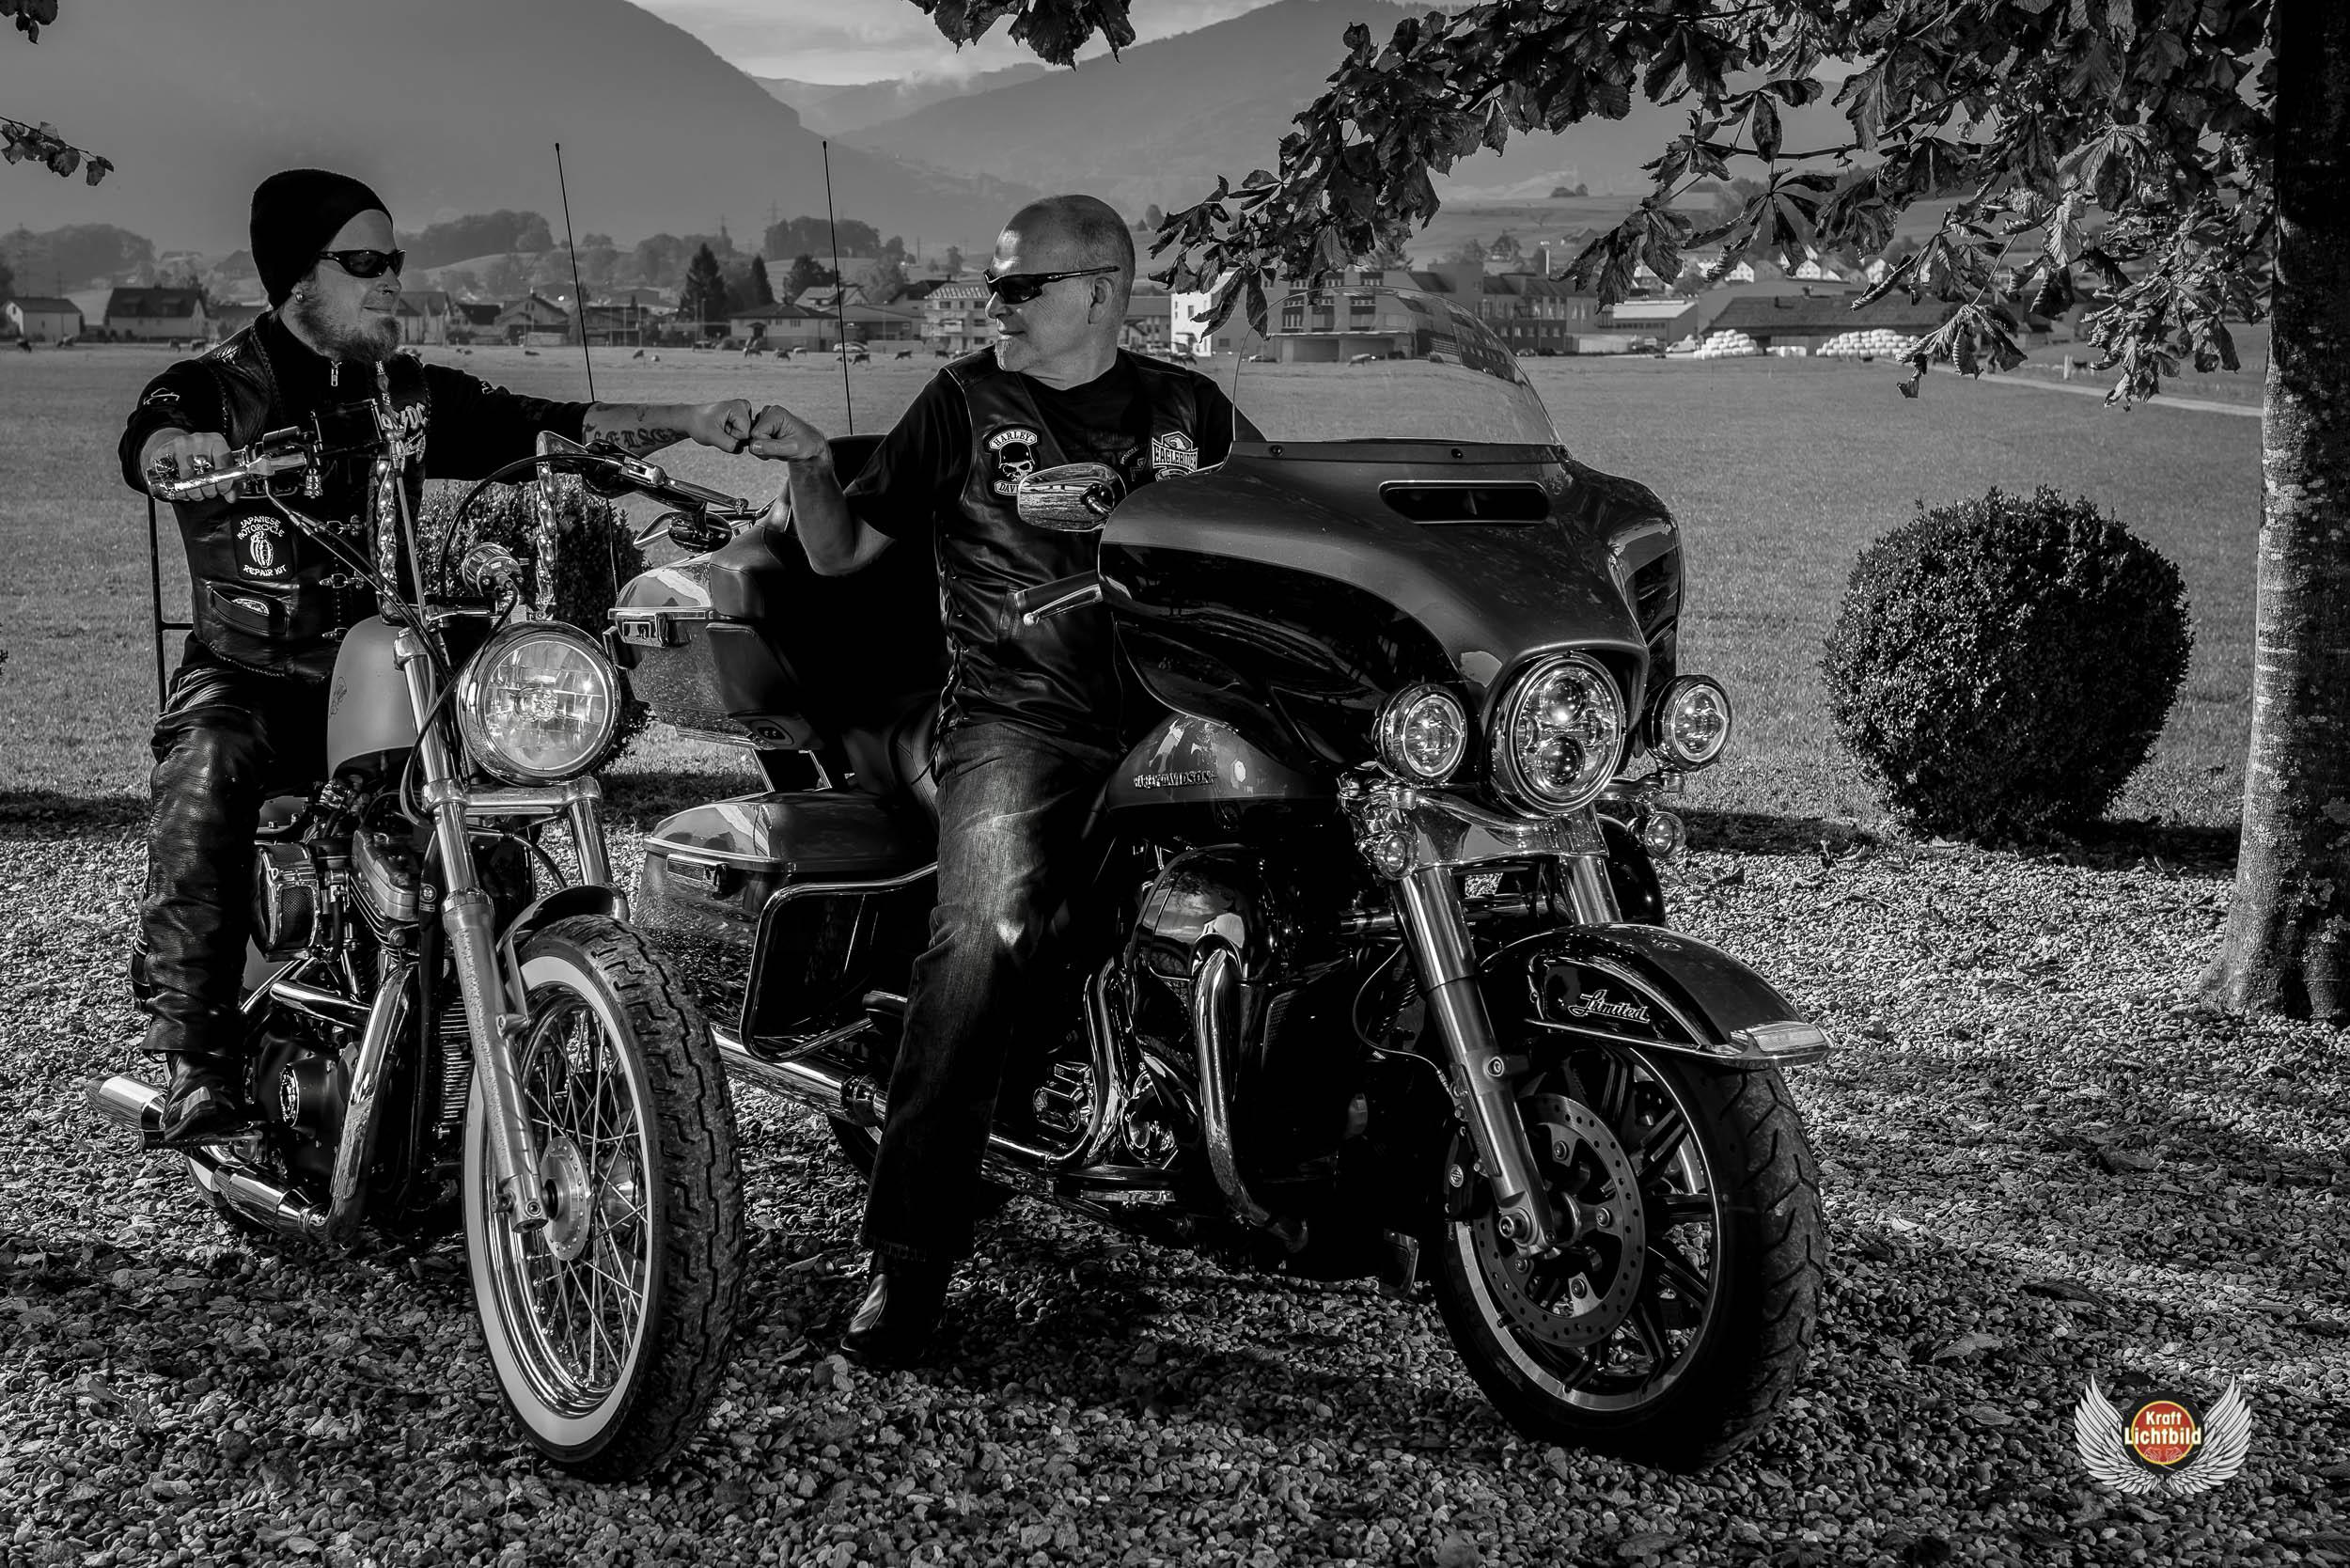 Urs und Ramon  with Harleys